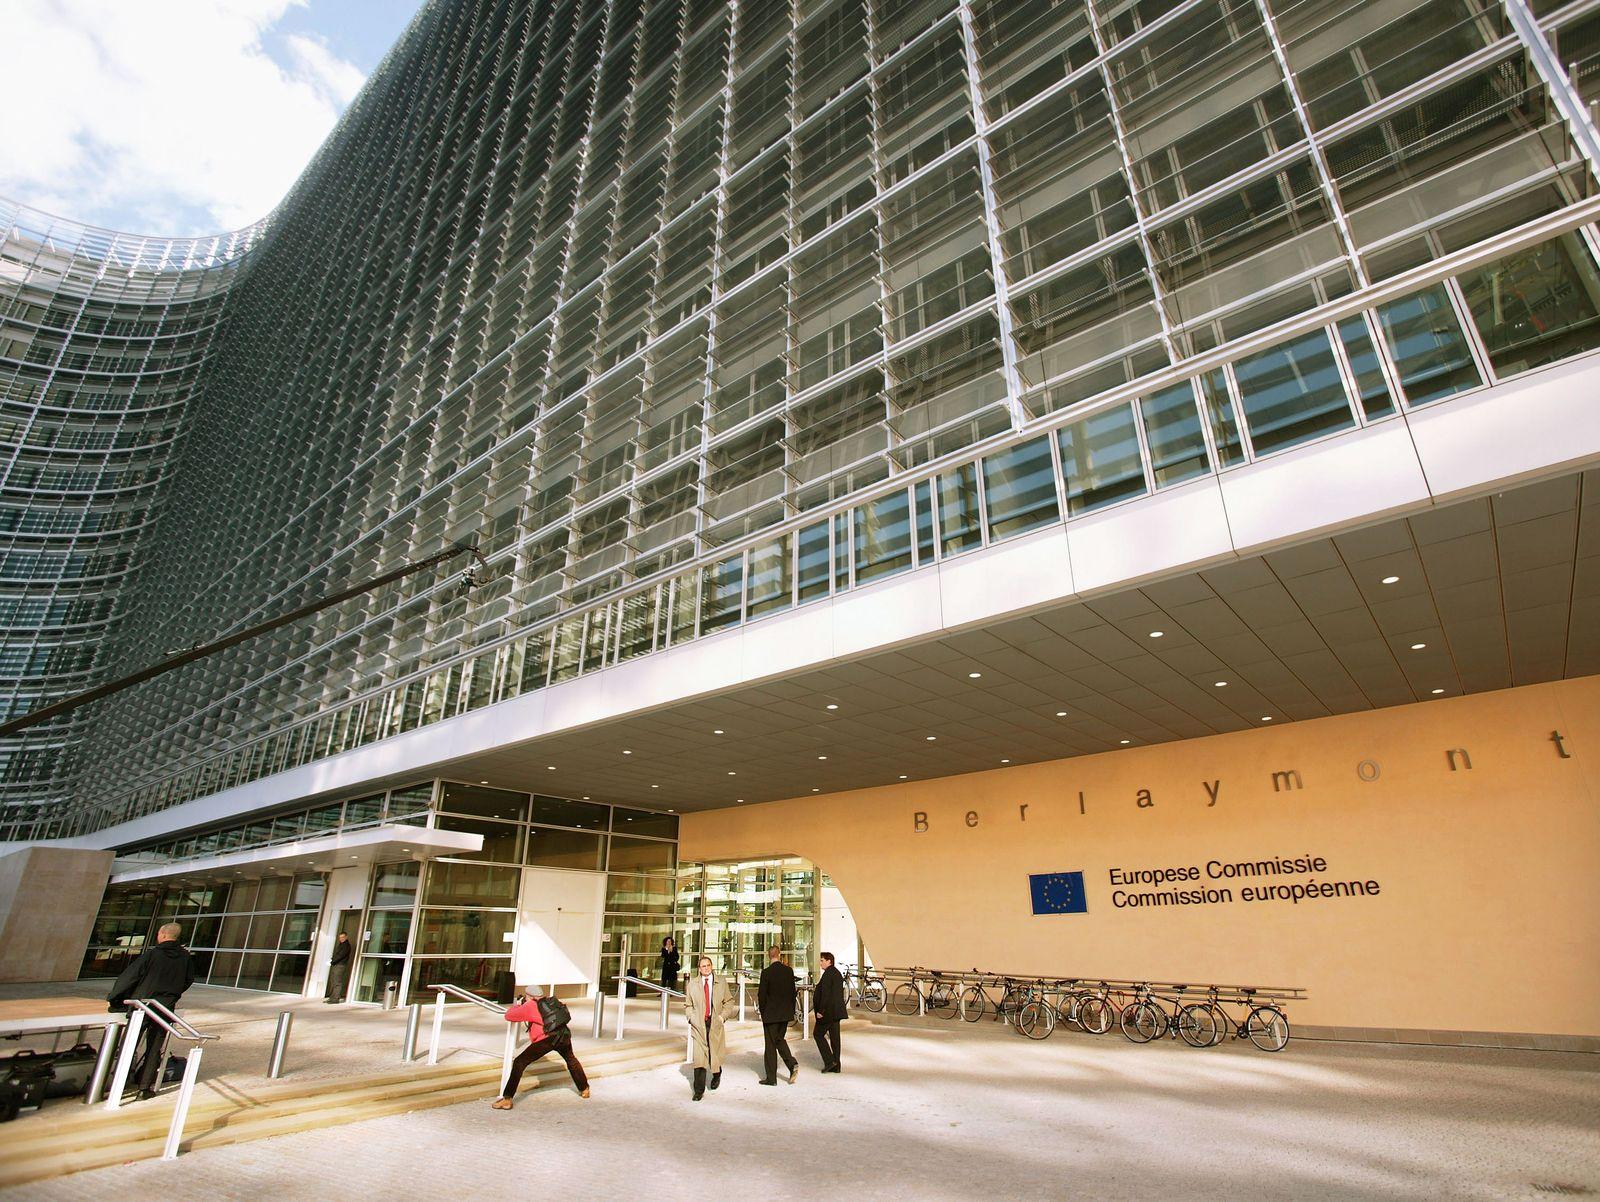 EU Kommission / Parlamentarier / Brüssel / Lobbyisten / Lobbyismus